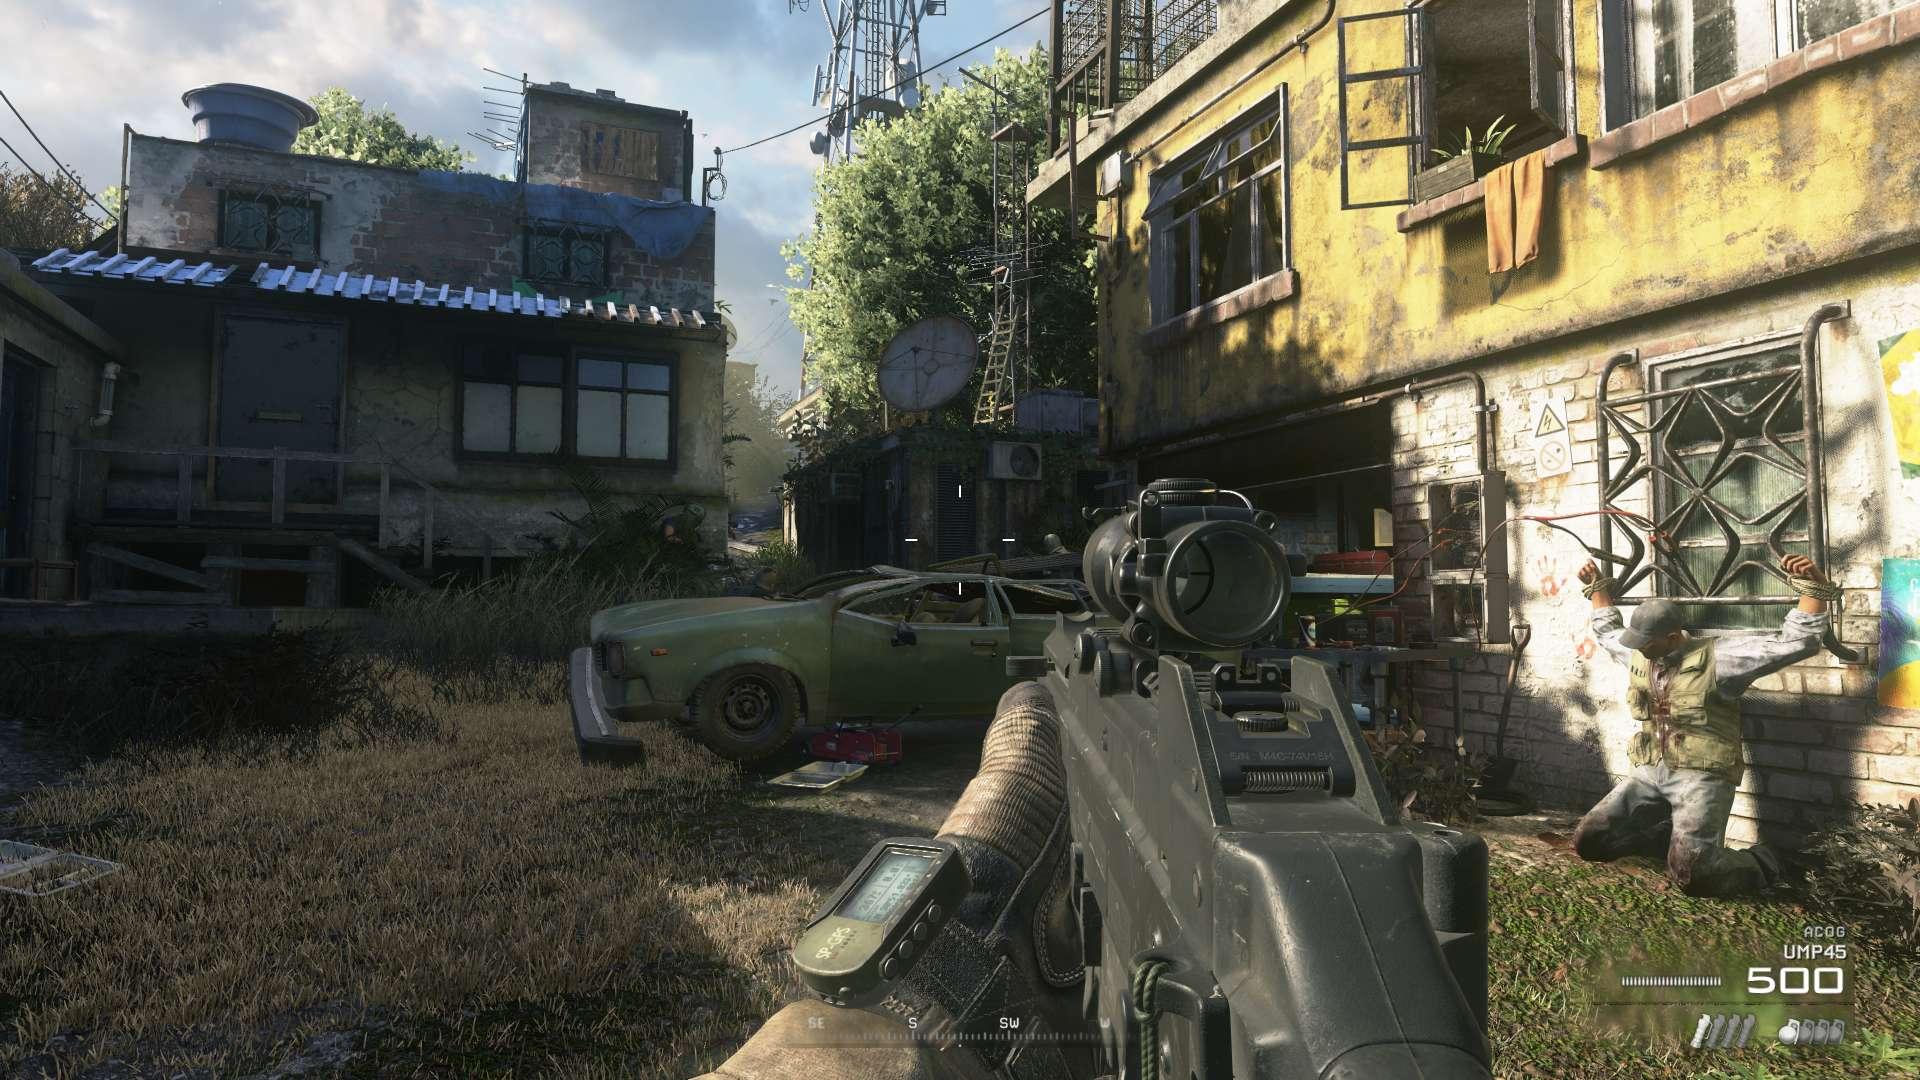 Call Of Duty Modern Warfare 2 Remastered Act Ii Review And Reflection The Infinite Zenith Backyard bbq modern warfare